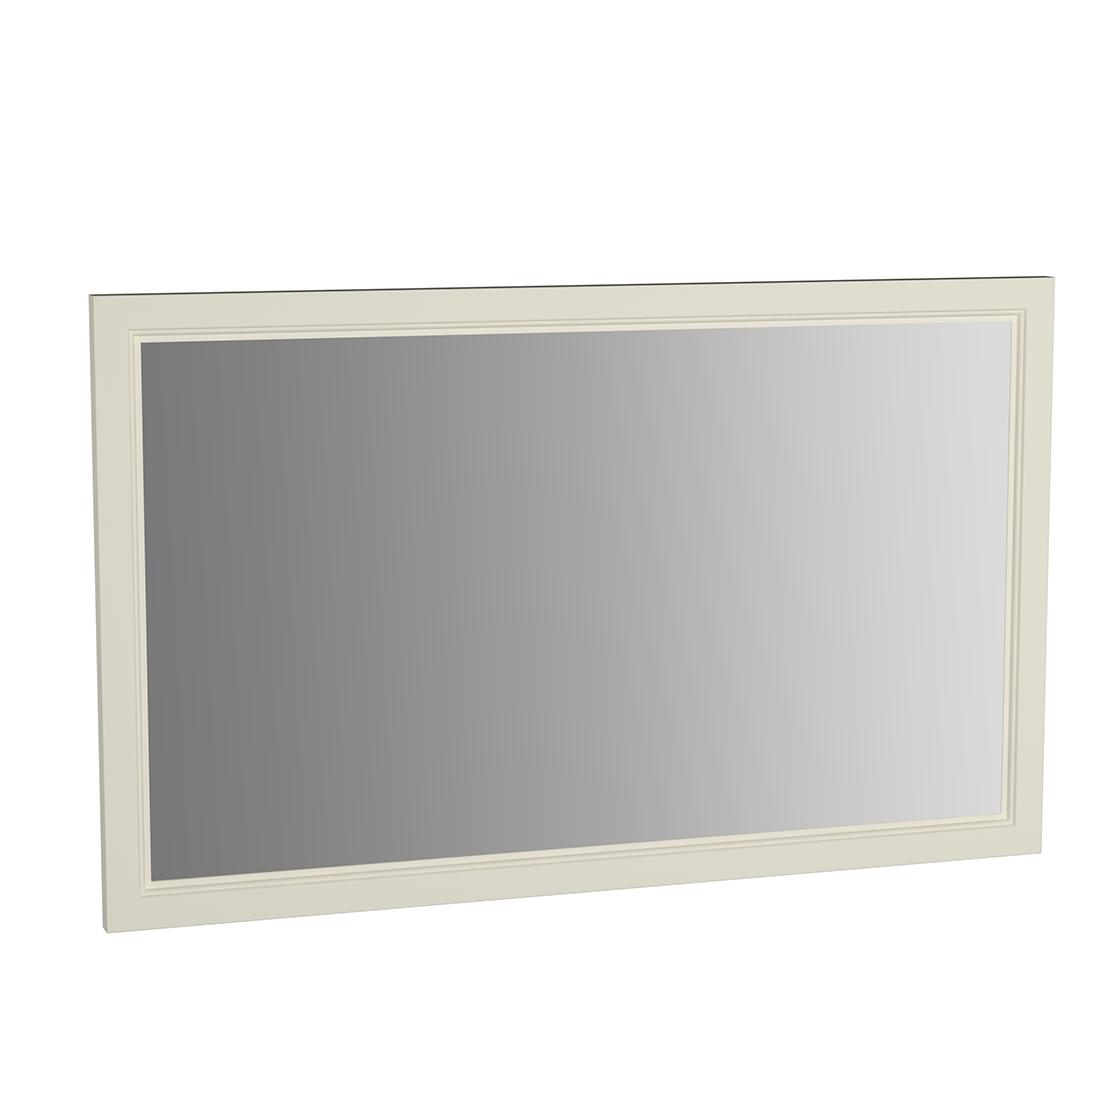 Valarte miroir, 120 cm, ivoire mat